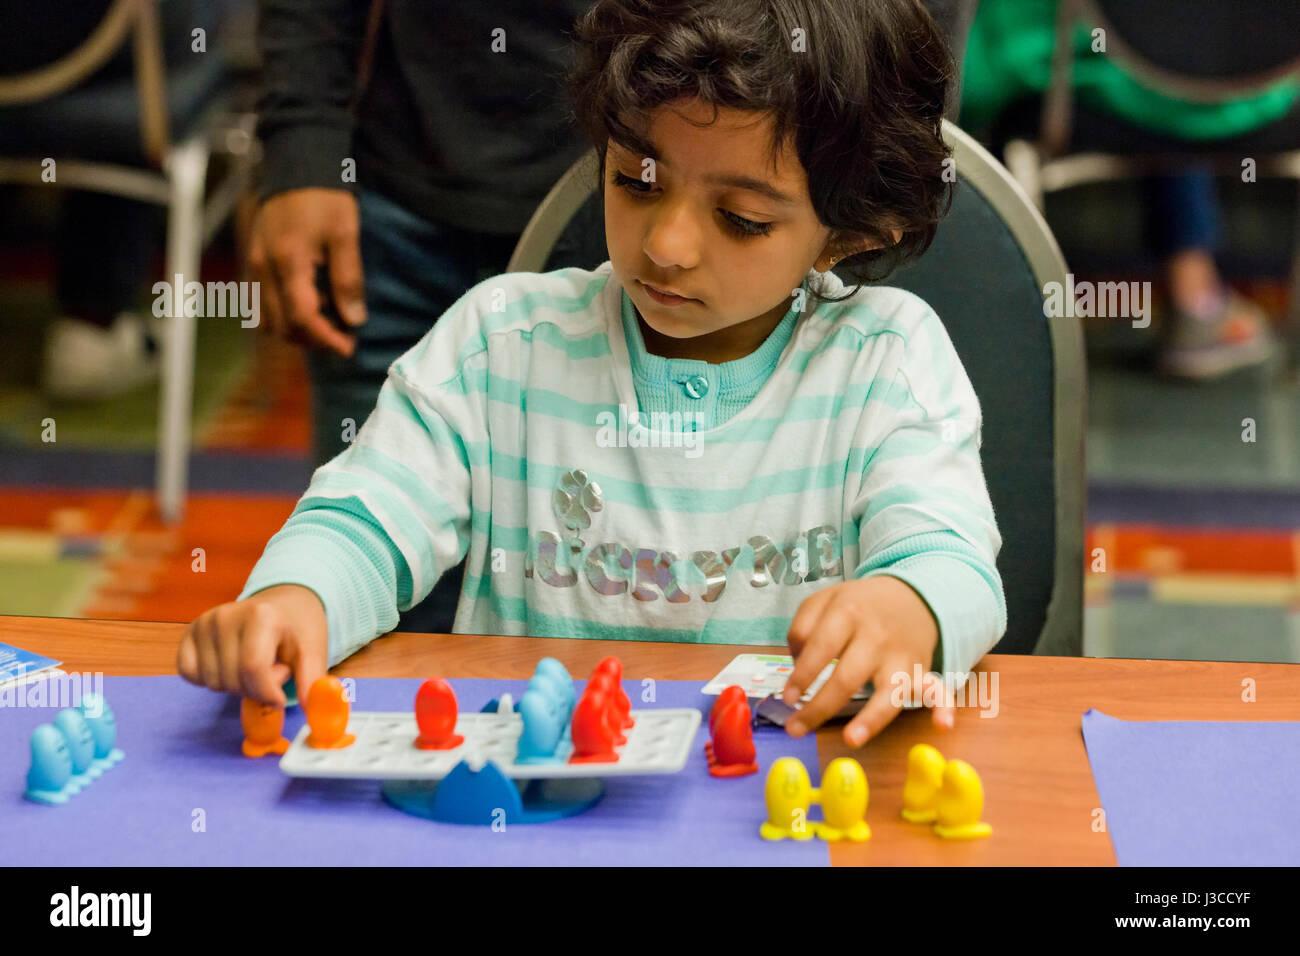 Girl playing Balance Beans board game - USA - Stock Image